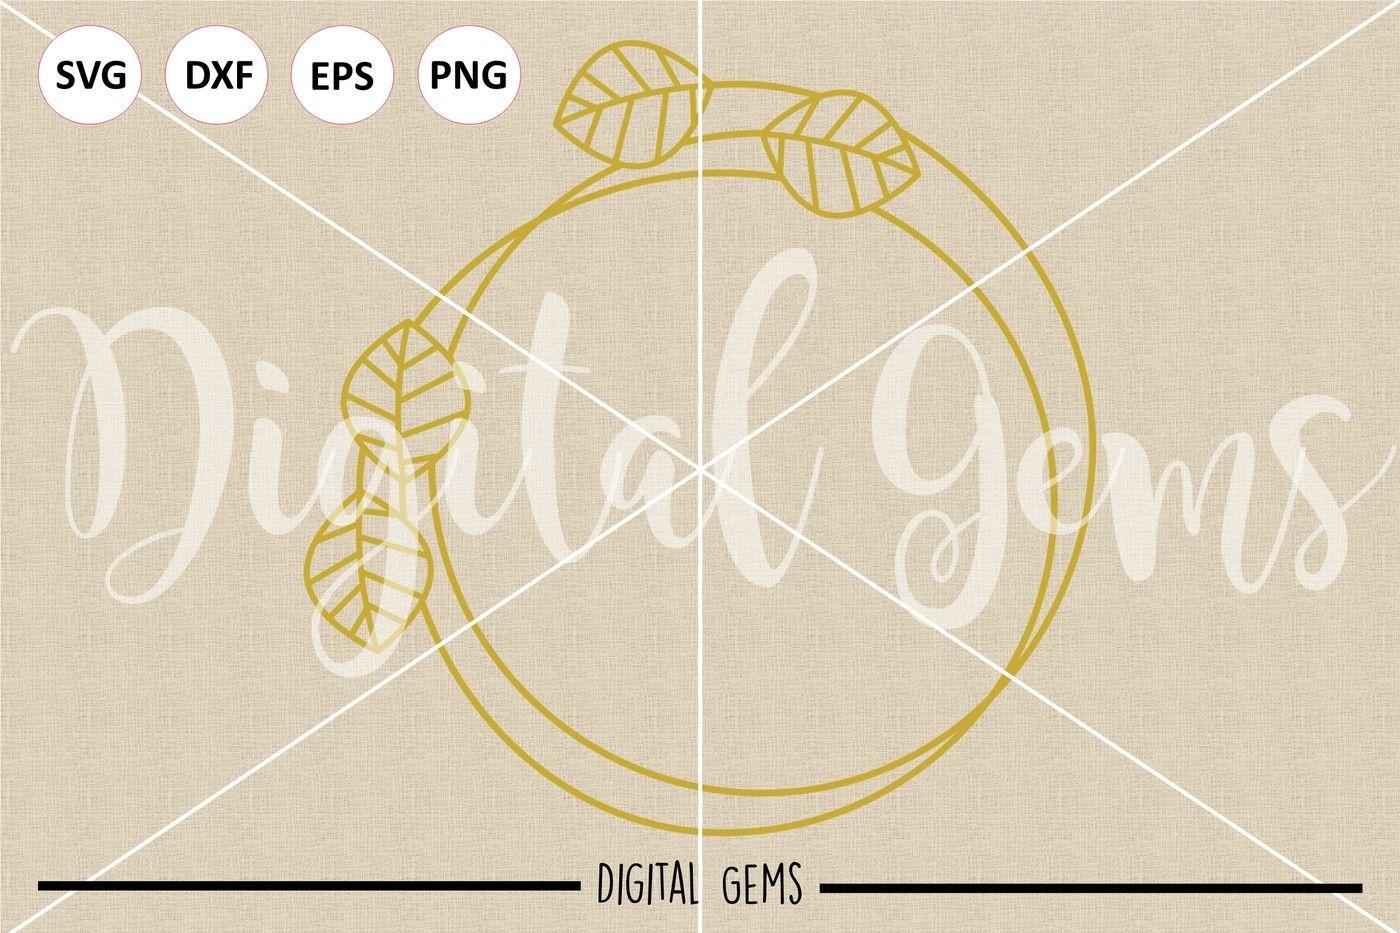 Monogram Frame Svg Dxf Eps Png Files By Digital Gems Thehungryjpeg Com